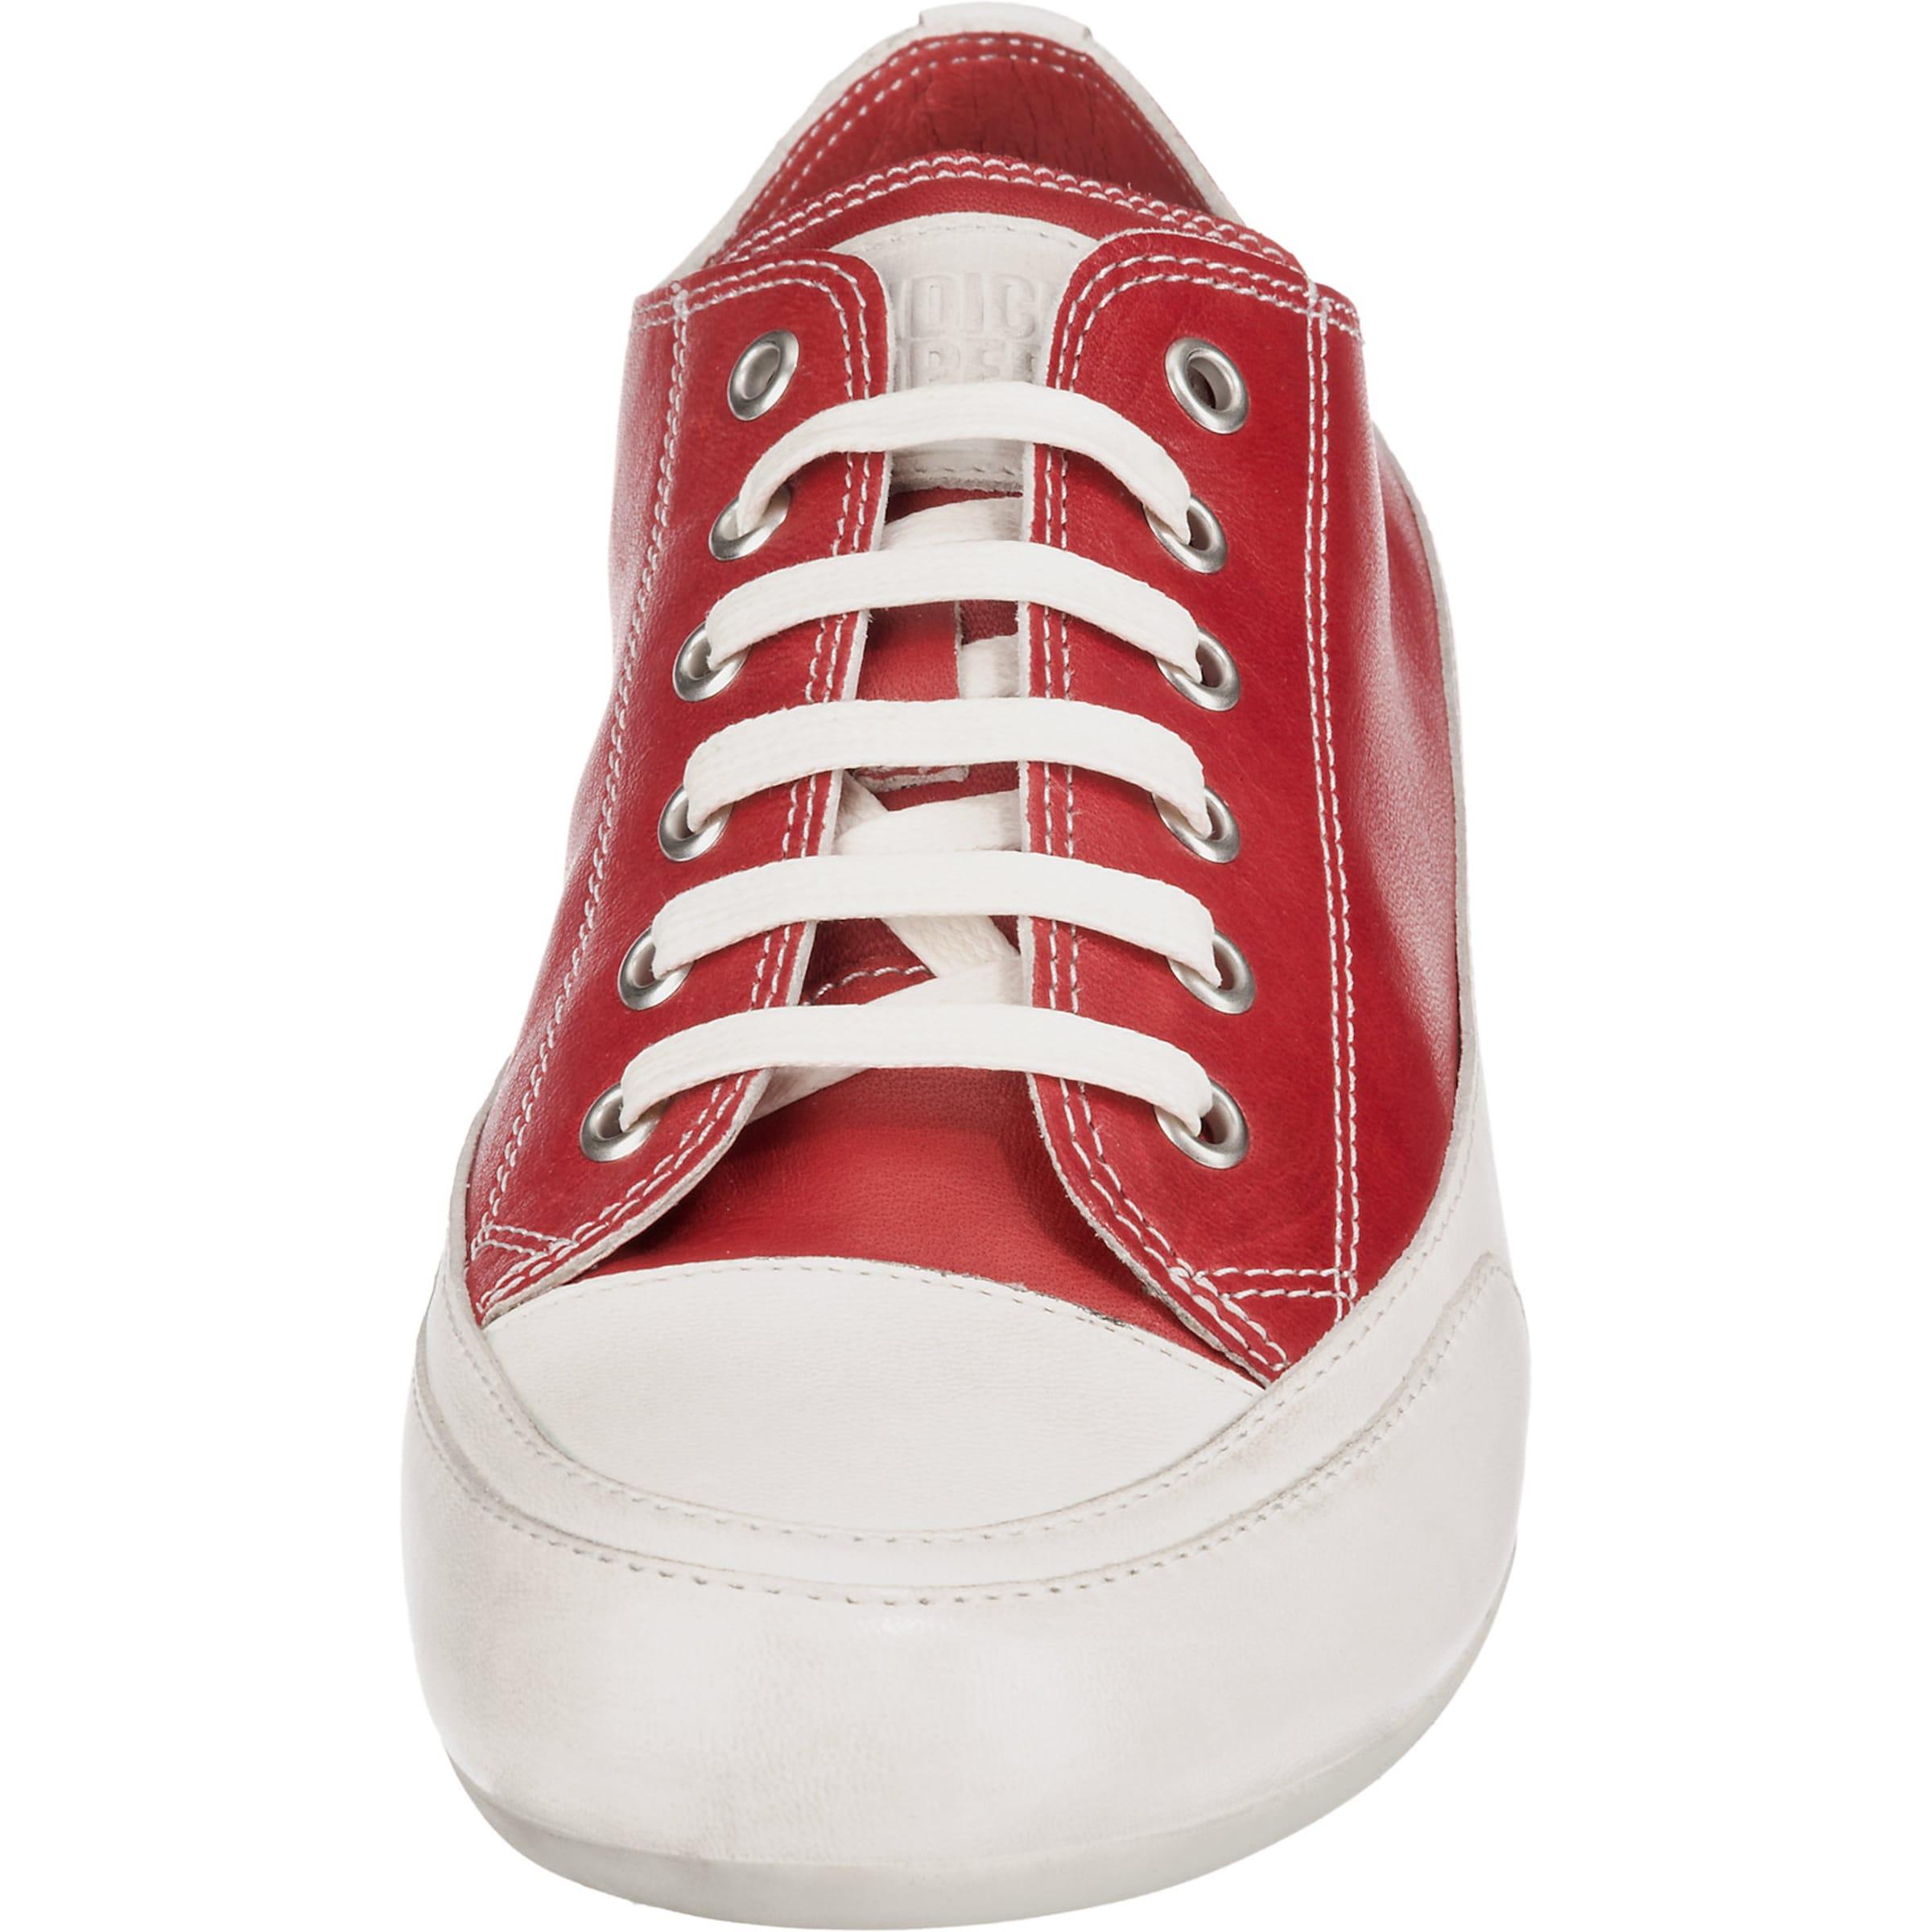 Low Sneakers RotWeiß Candice Cooper In zVMpGqSU